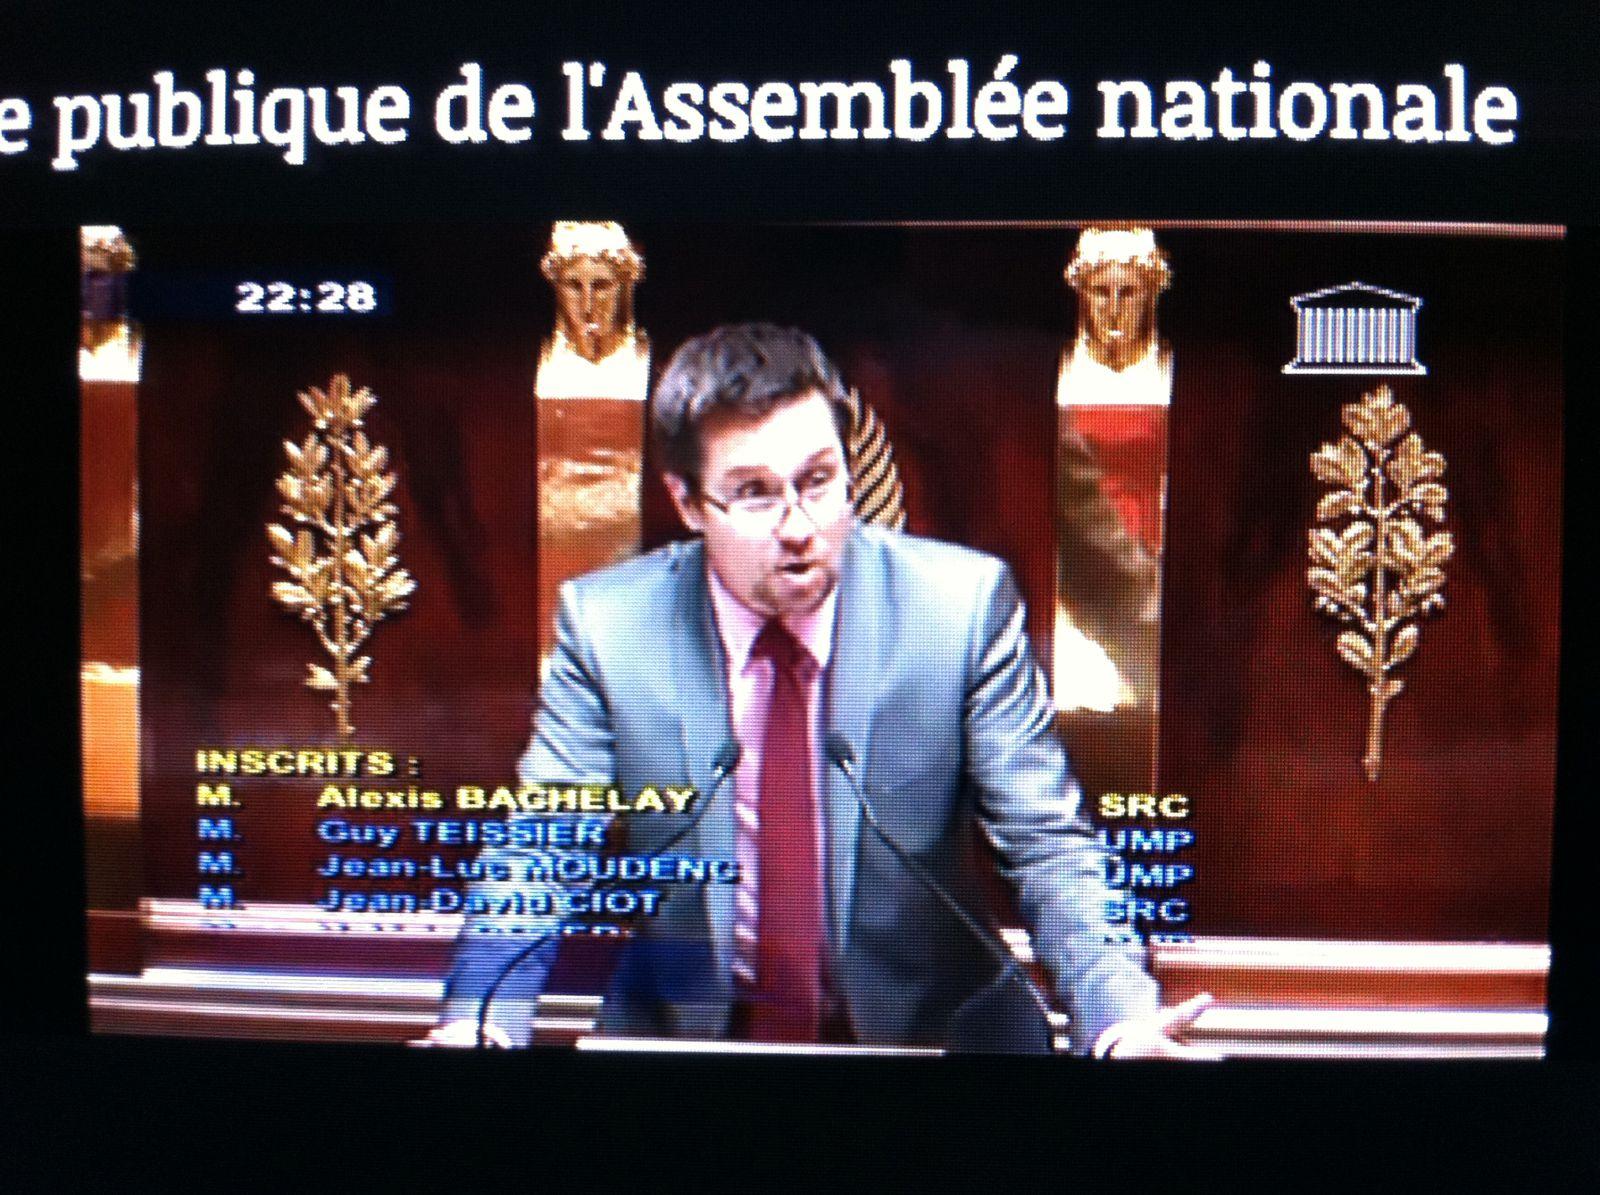 ALEXIS BACHELAY A L'ASSEMBLEE NATIONALE